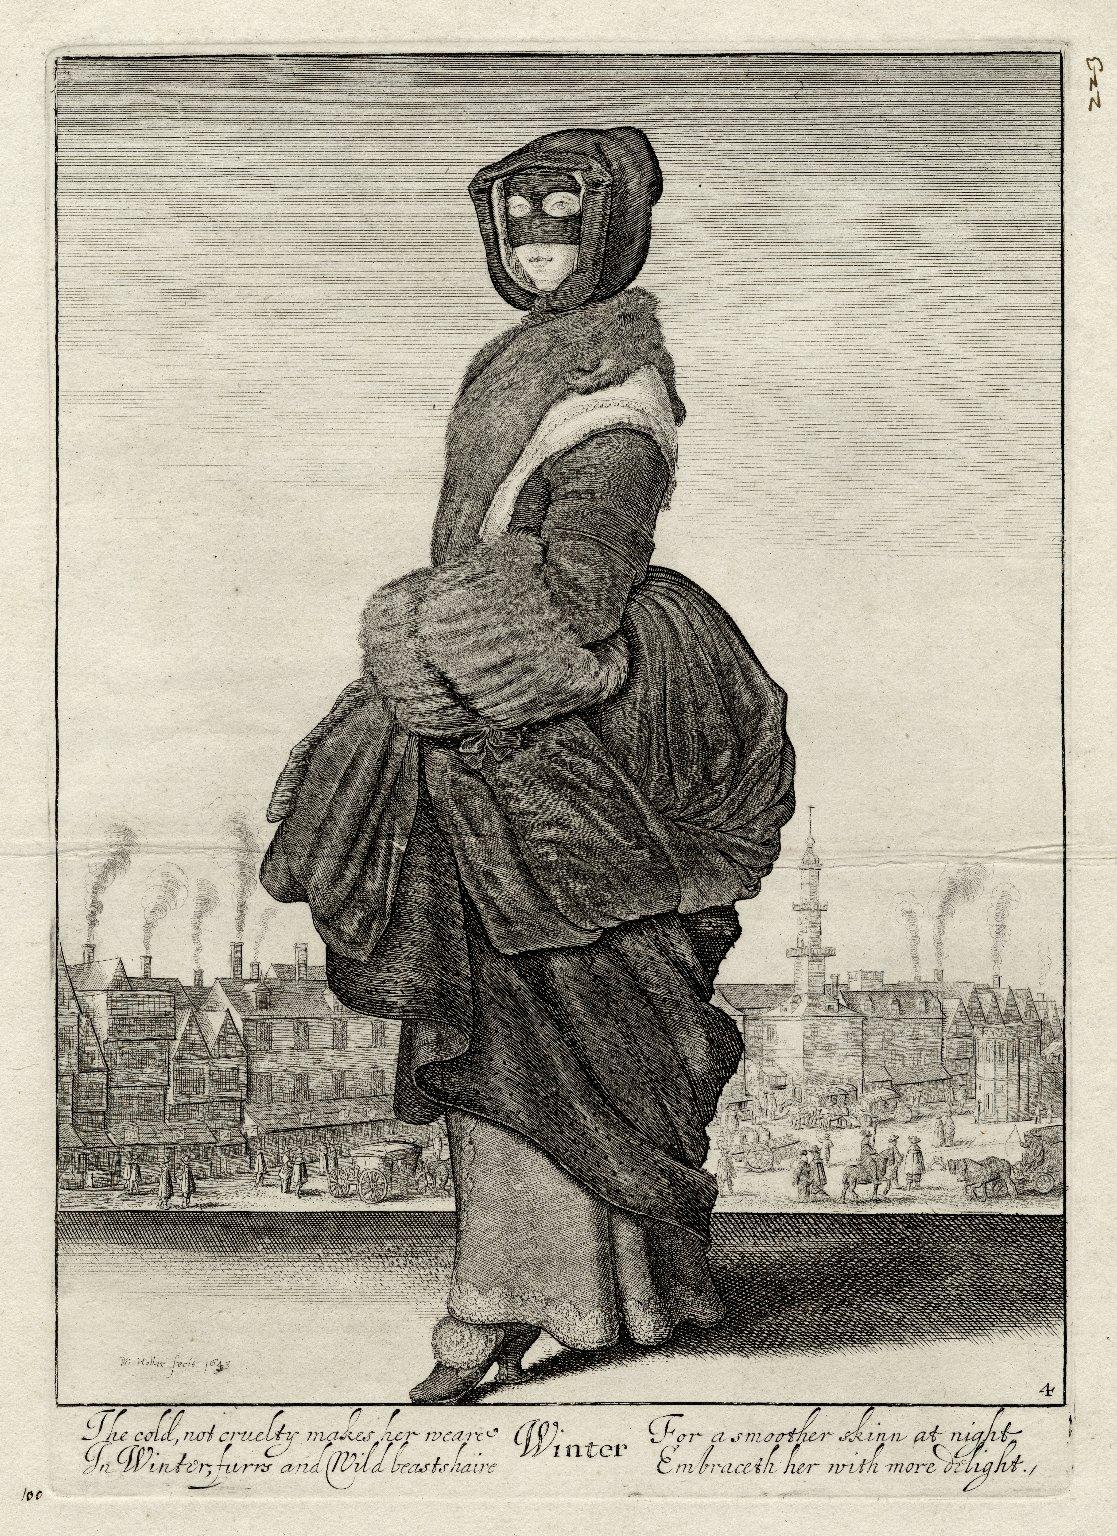 Winter [graphic] / W. Hollar fecit, 1643.